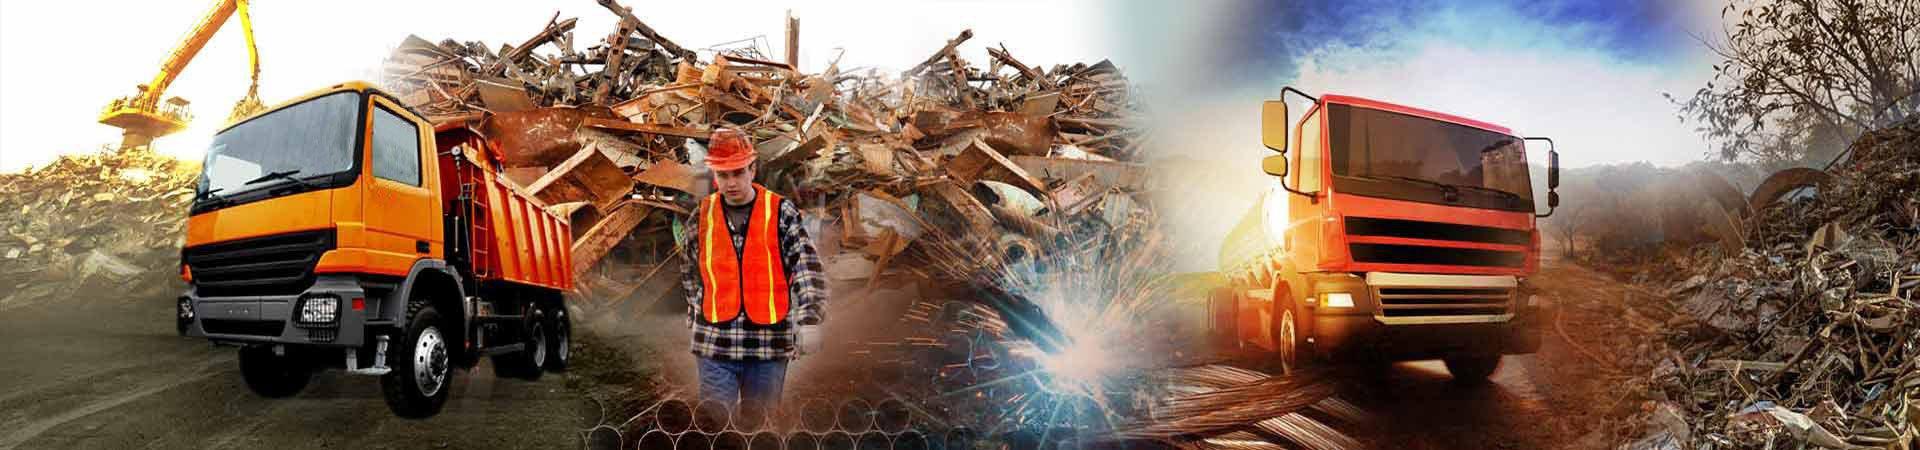 sydney copper recycling recycle crane metals man